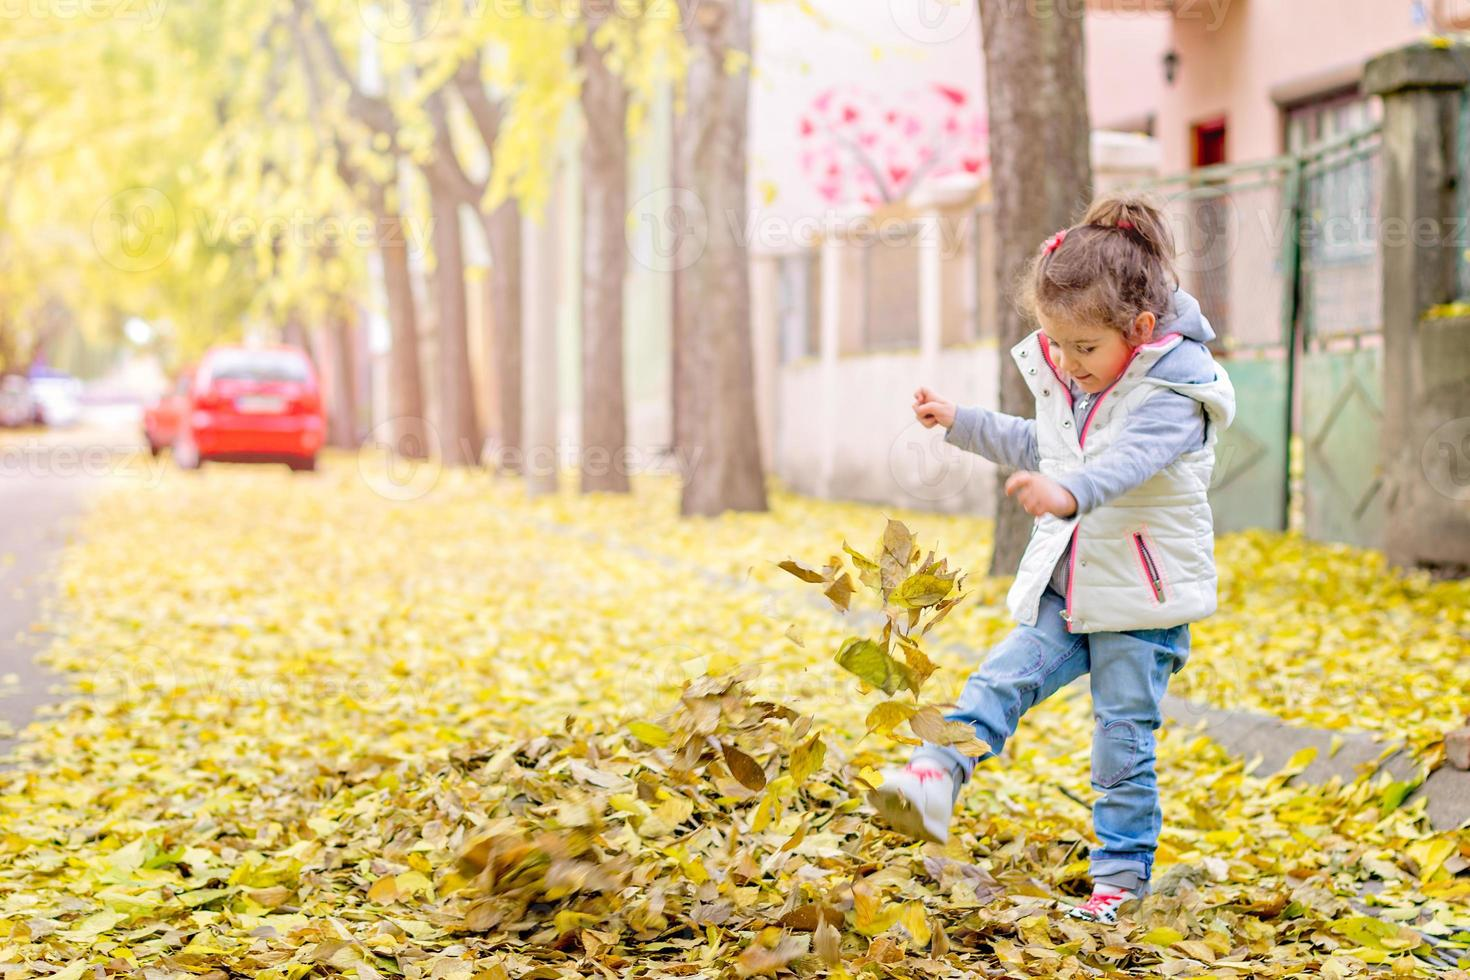 child enjoys kicking with leaves photo